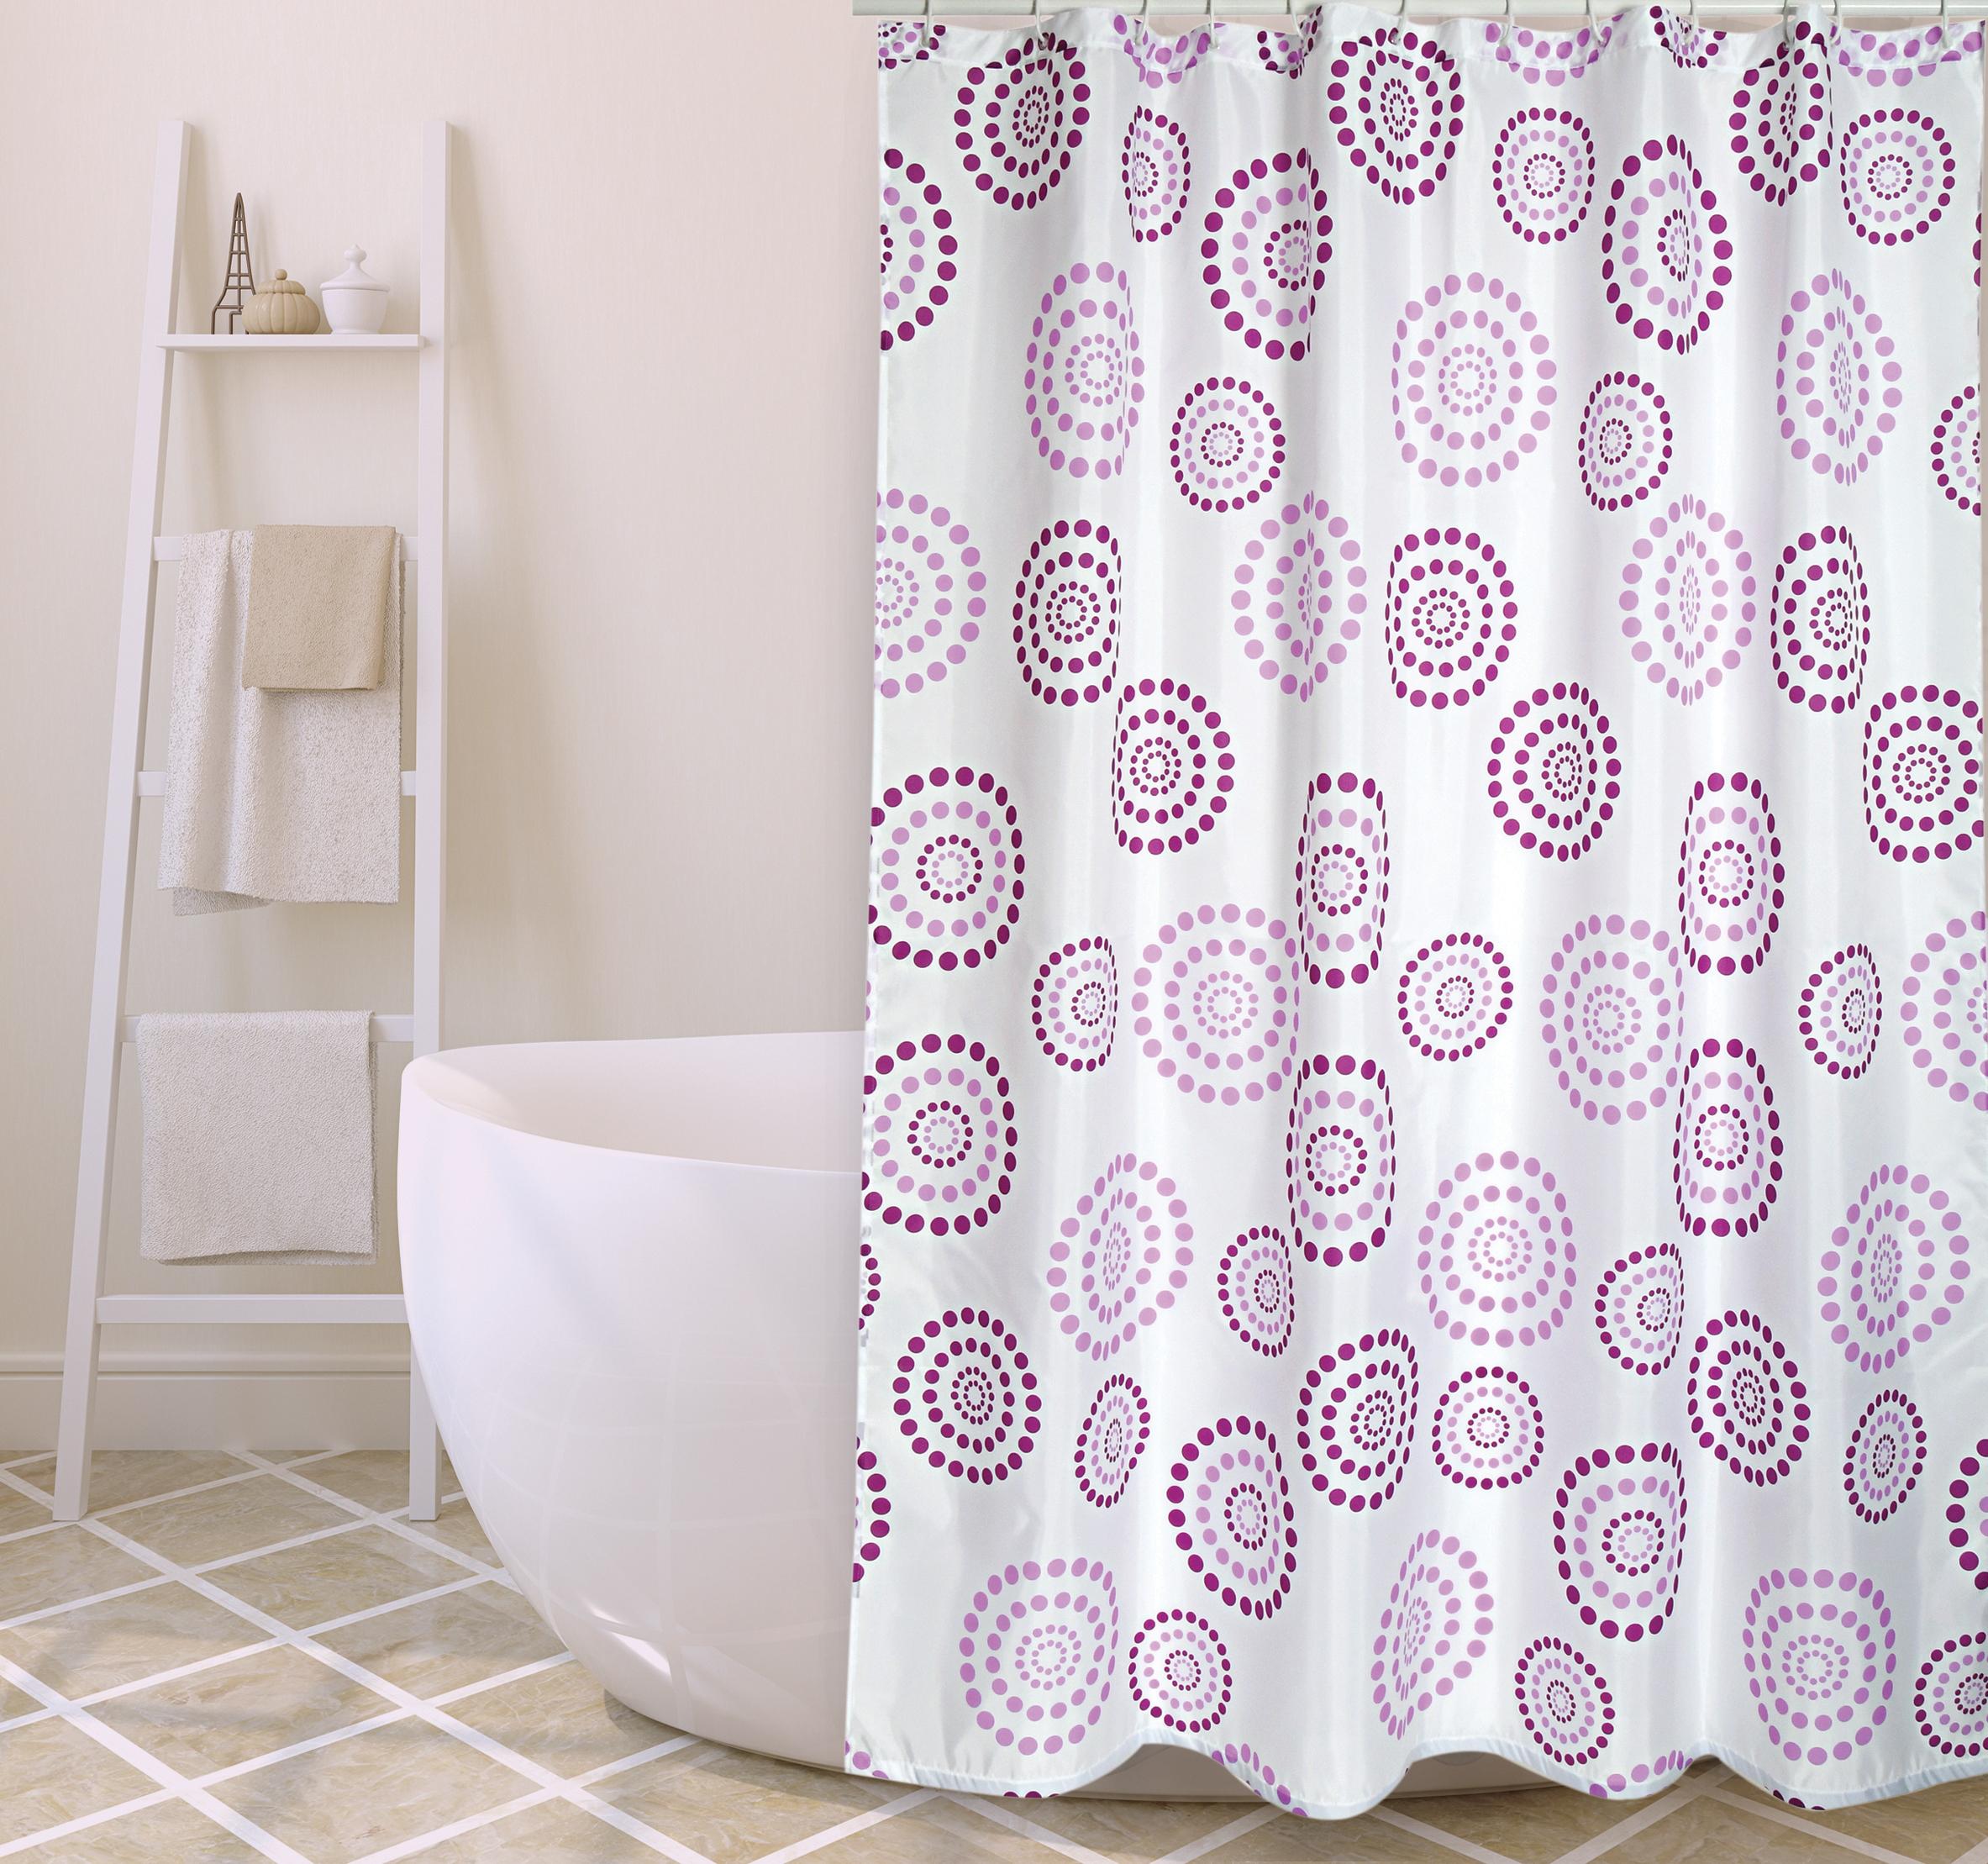 MSV Duschvorhang 180x200cm Anti Schimmel Textil Badewannenvorhang Wannenvorhang Kreise Lila